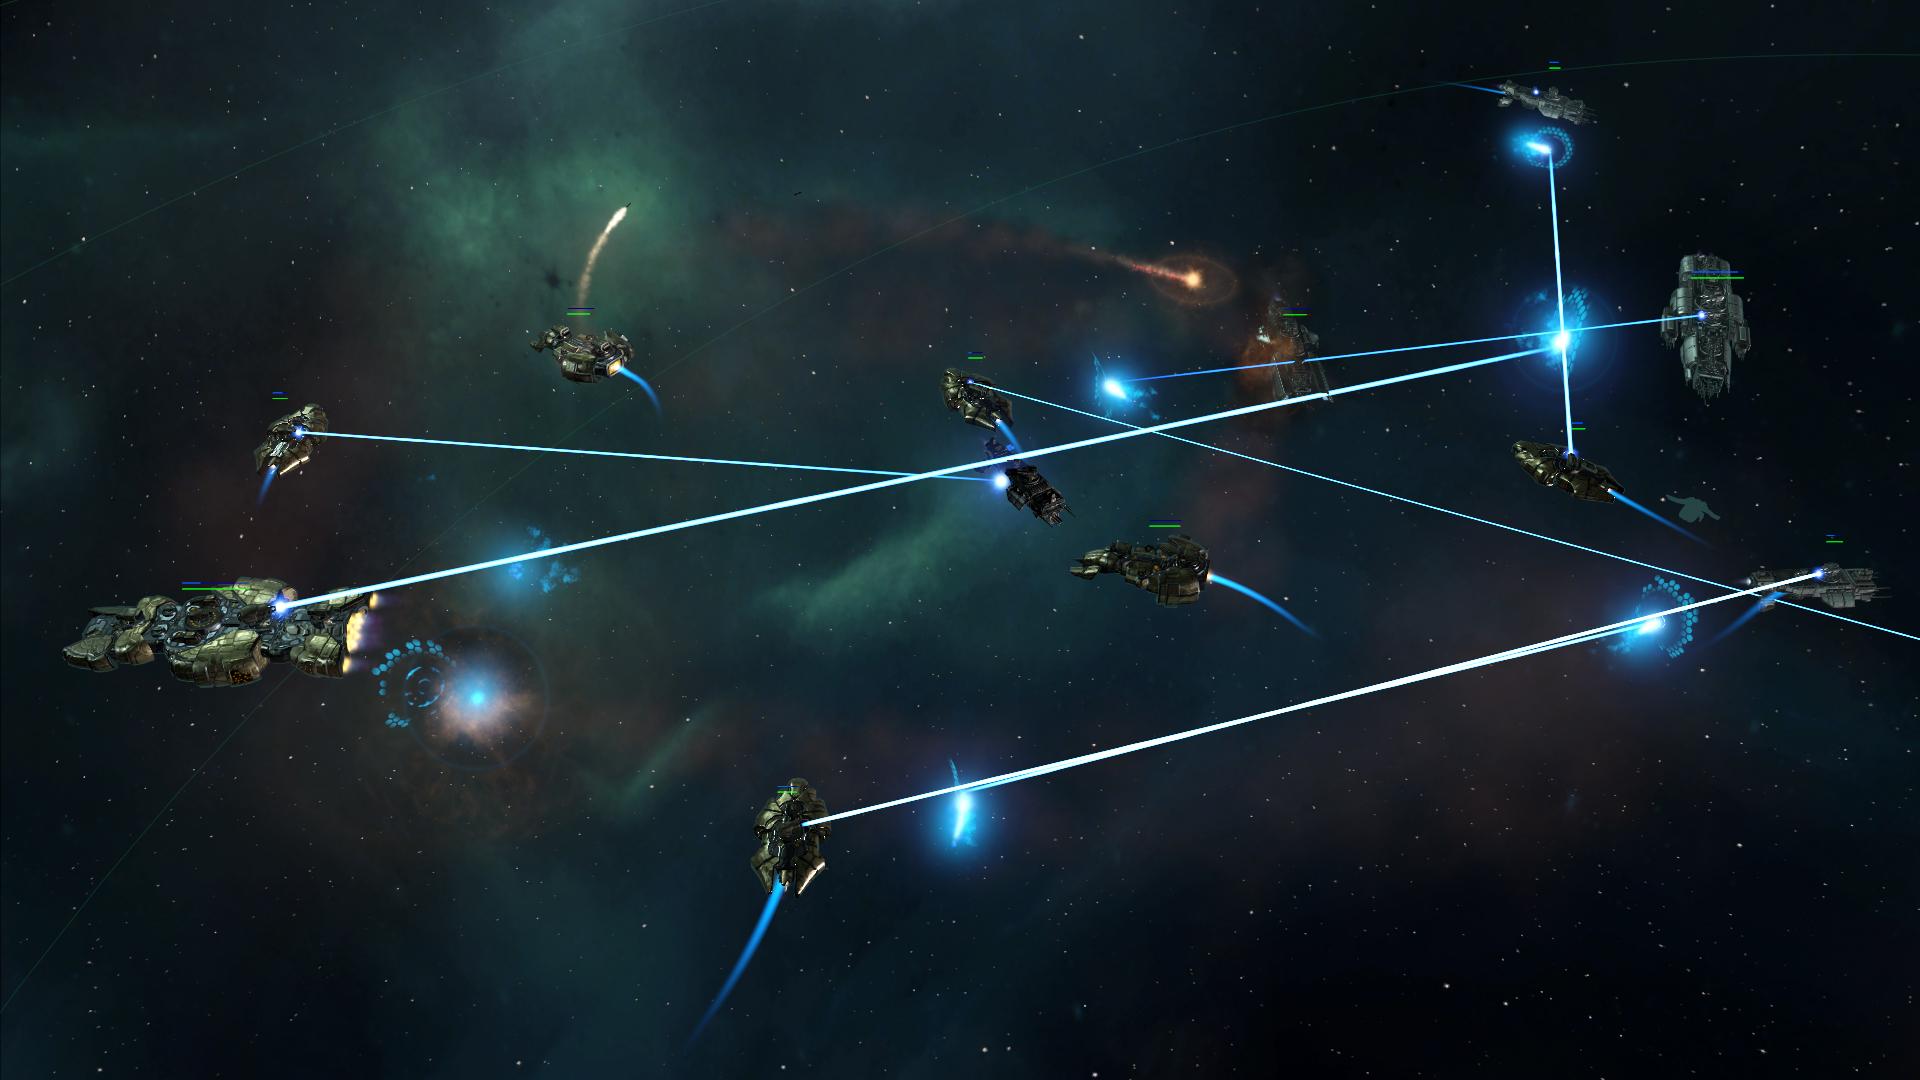 stellaris_dev_diary_02_03_20120928_ship_combat.jpg